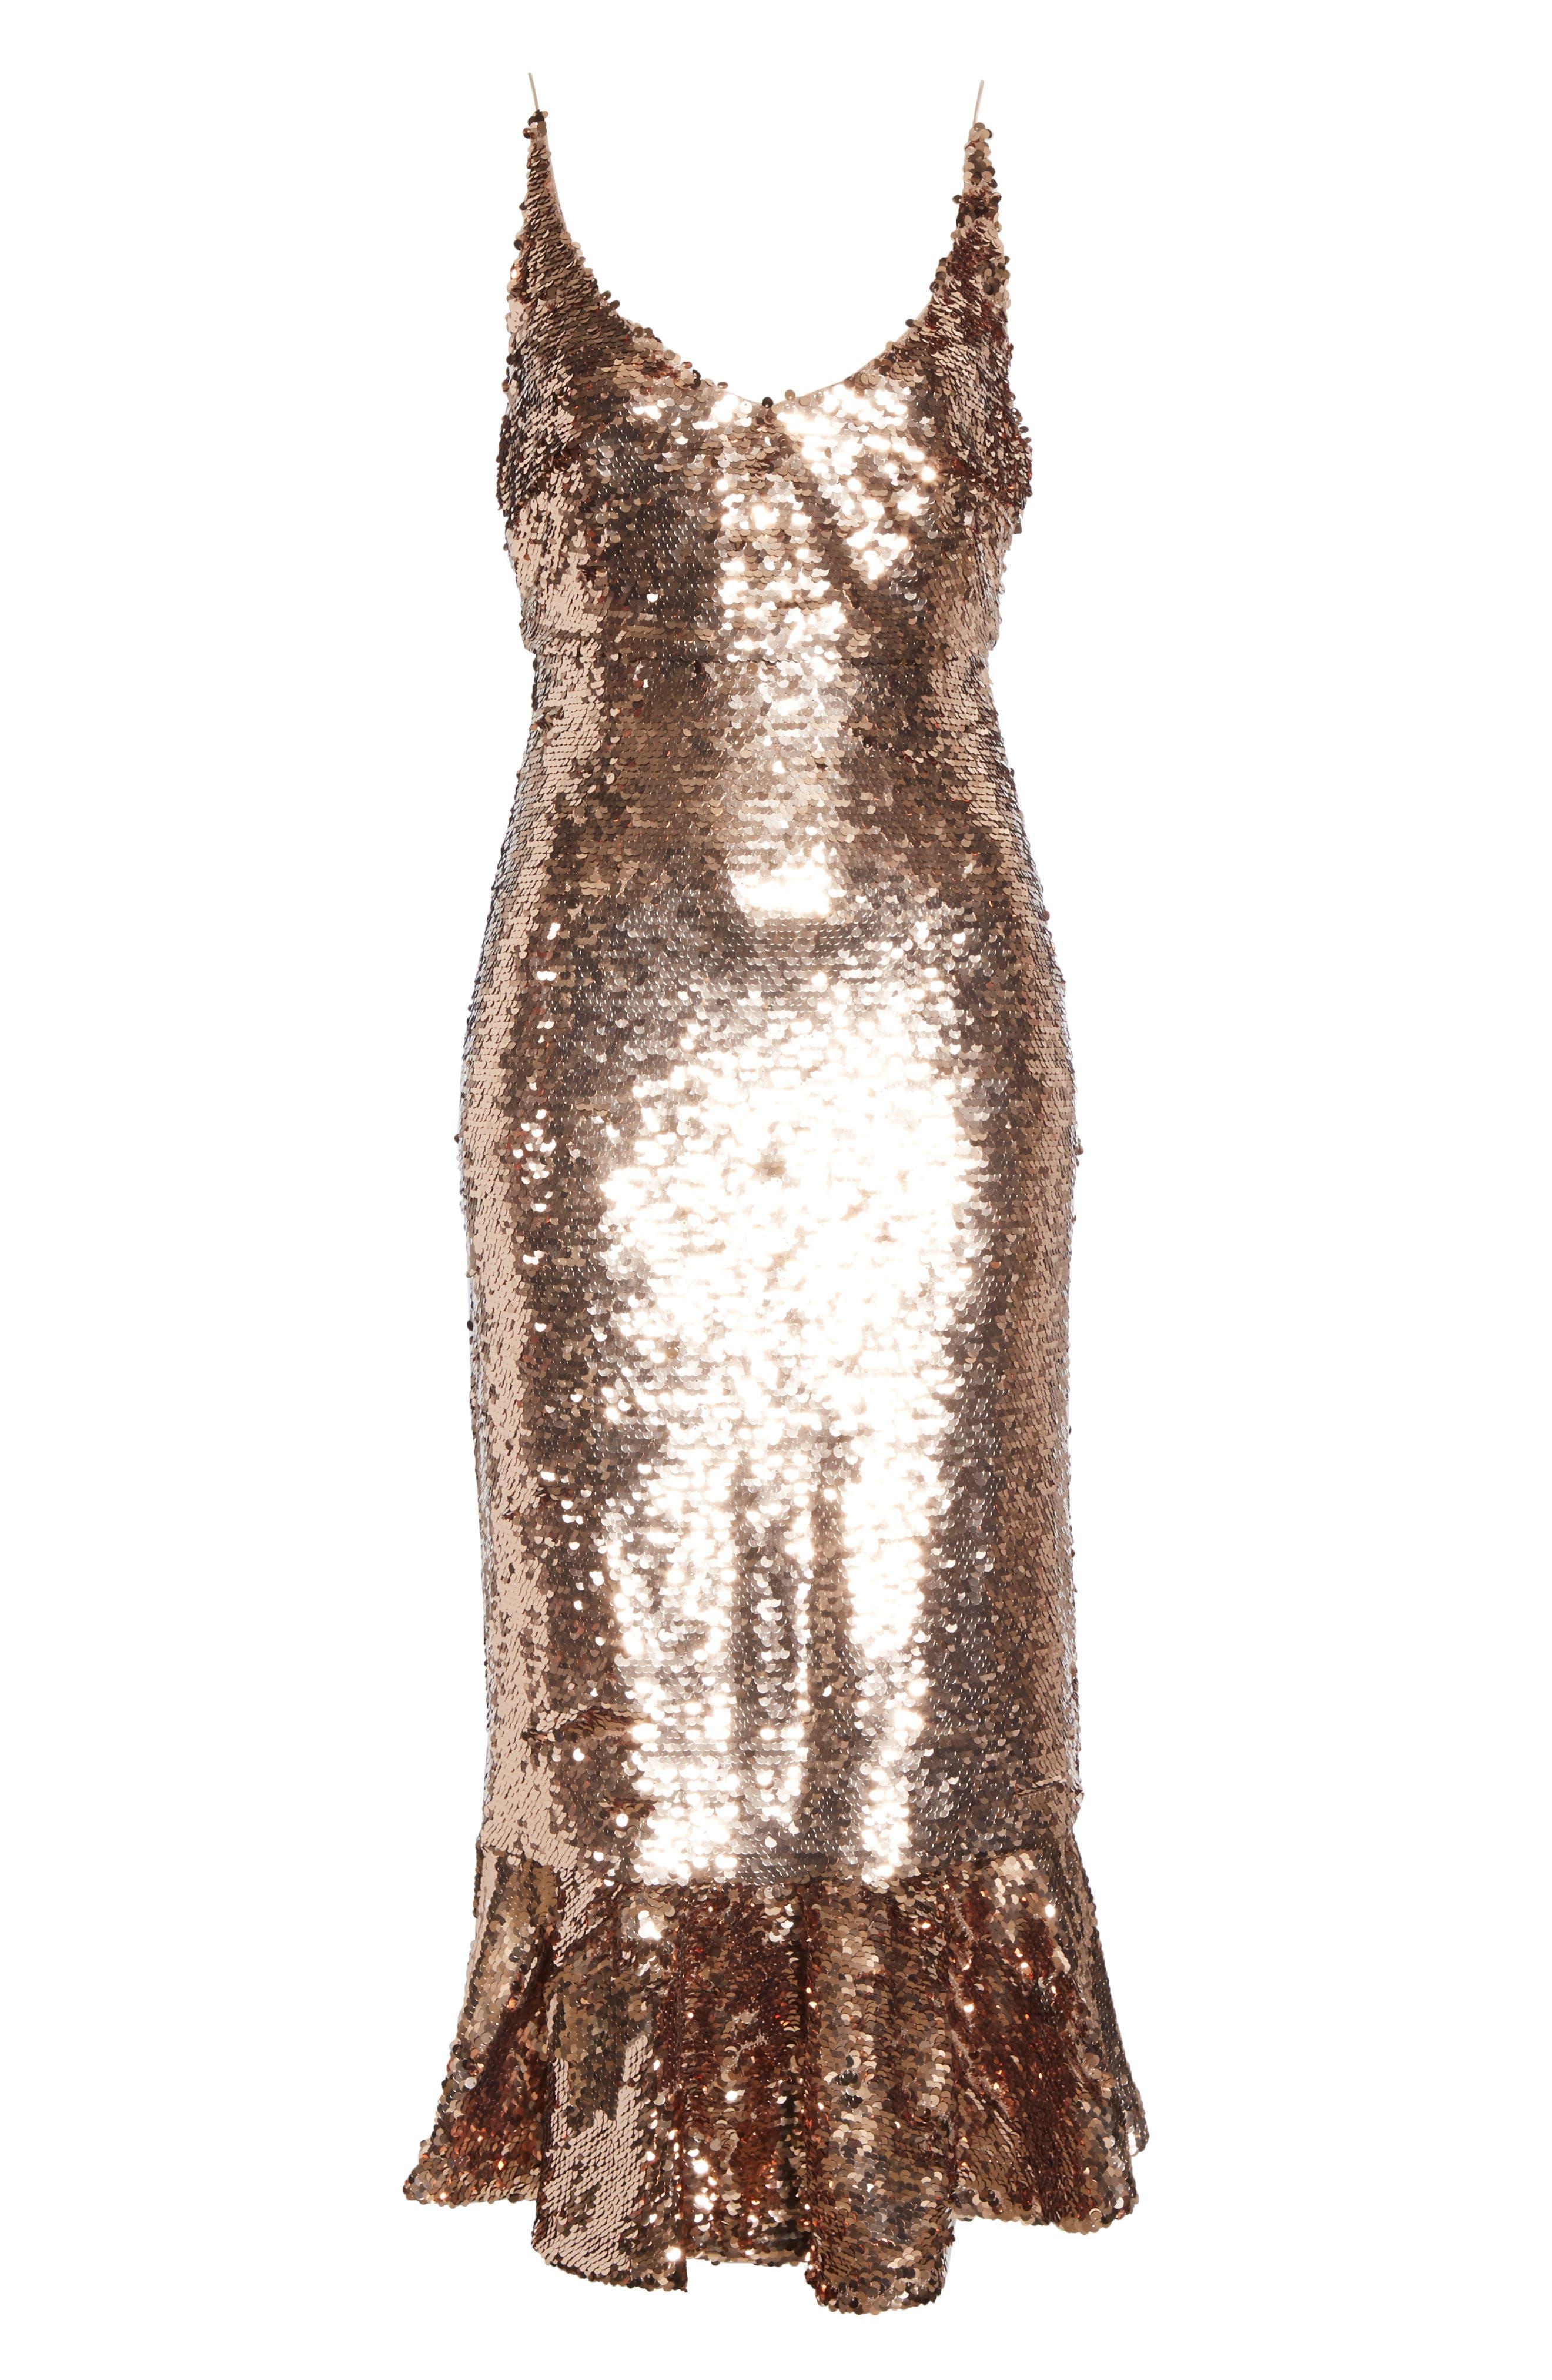 SALONI, Aidan Sequin Ruffle Hem Midi Dress, Alternate thumbnail 7, color, BRONZE